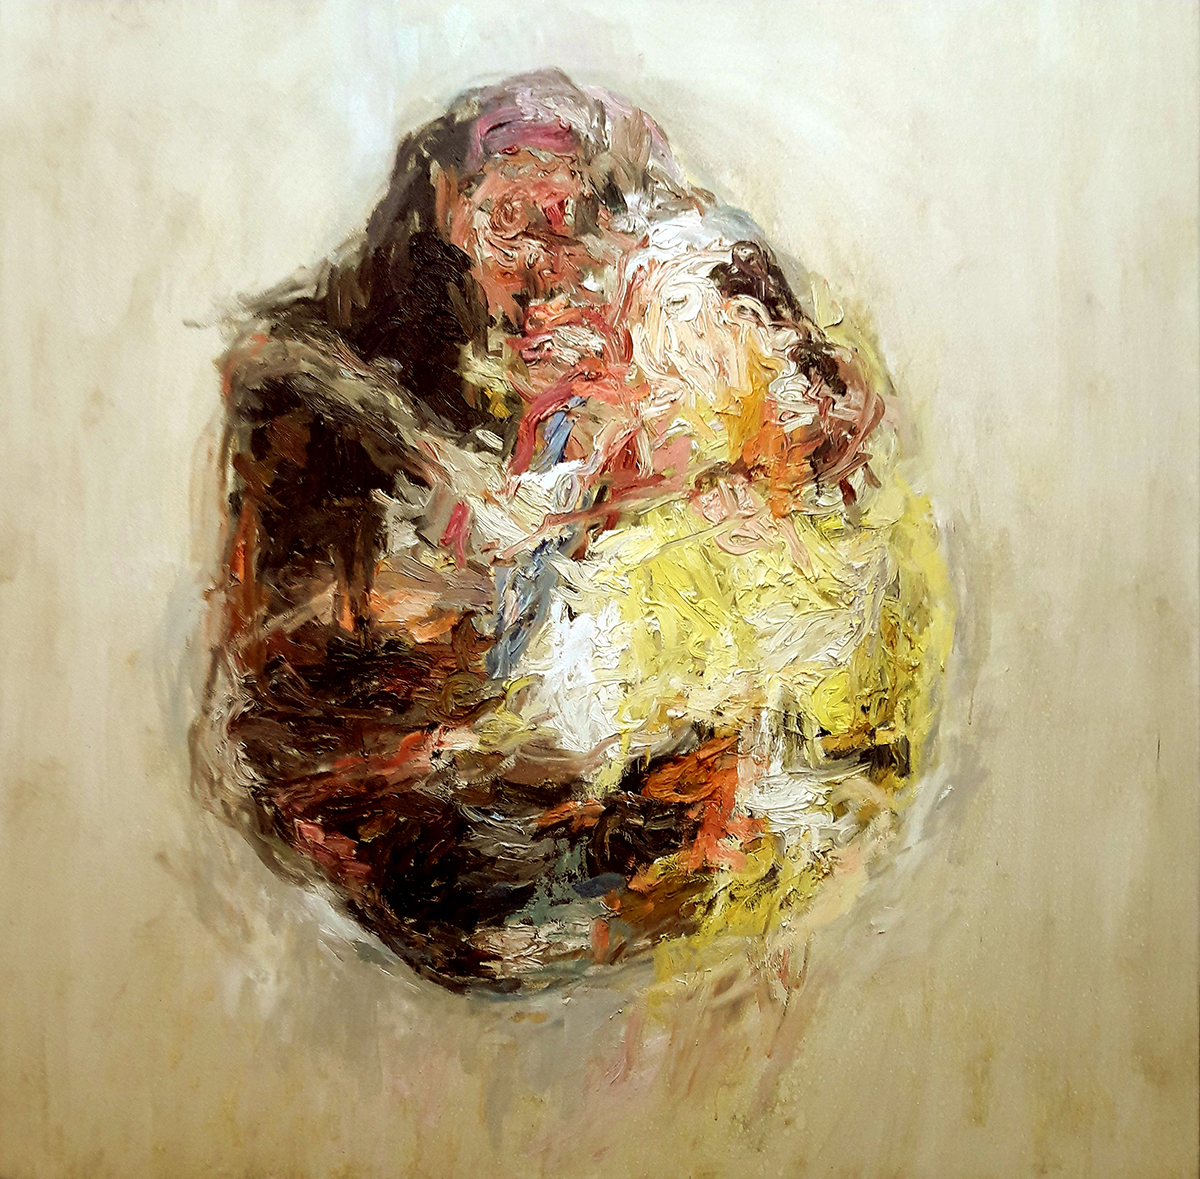 khyyam-zedan-150-150cm-oil-on-canvas-2018